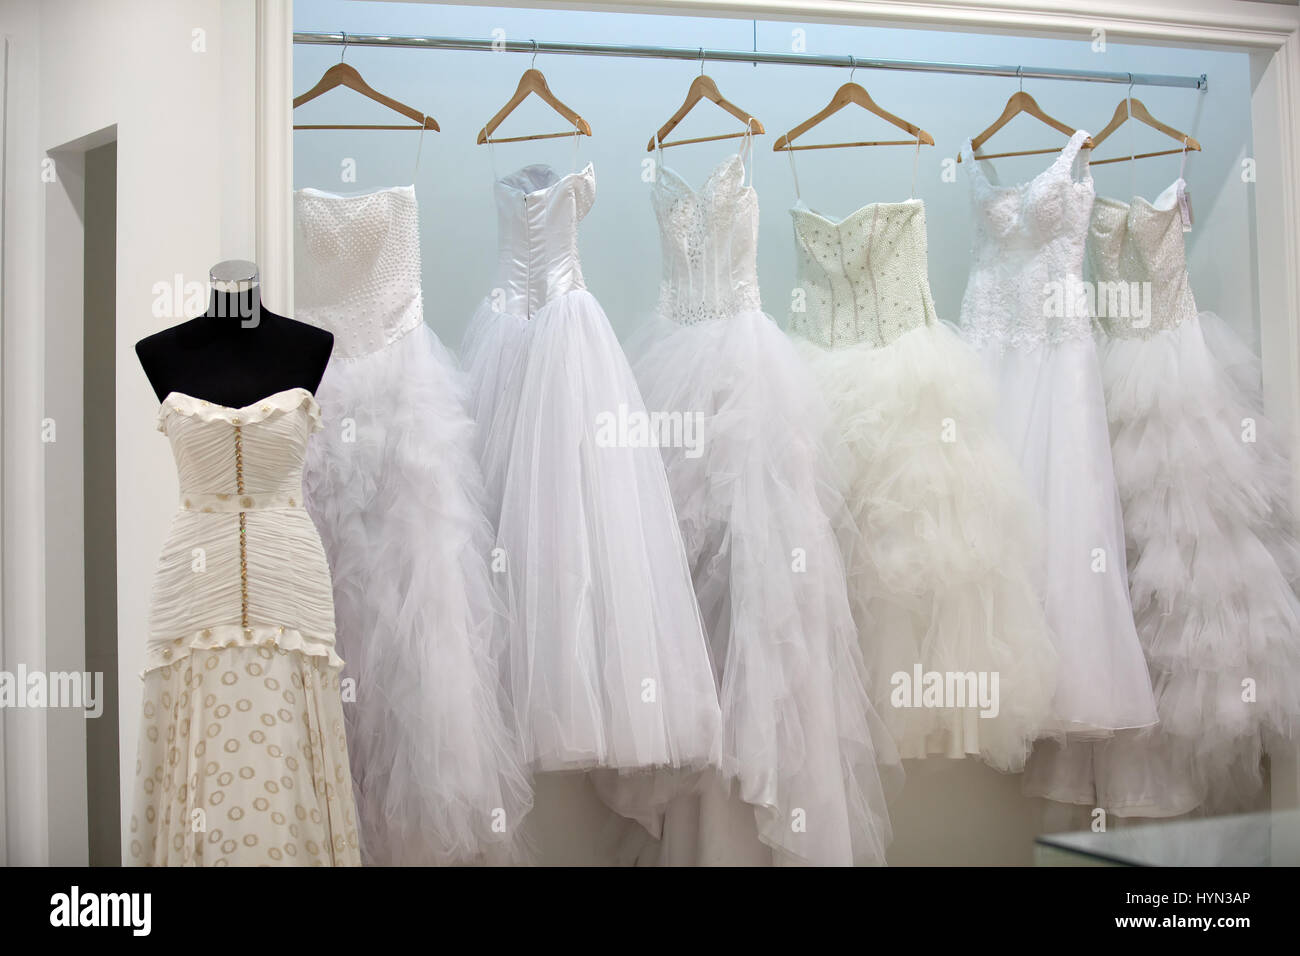 Fancy Dress Shop Stockfotos & Fancy Dress Shop Bilder - Alamy